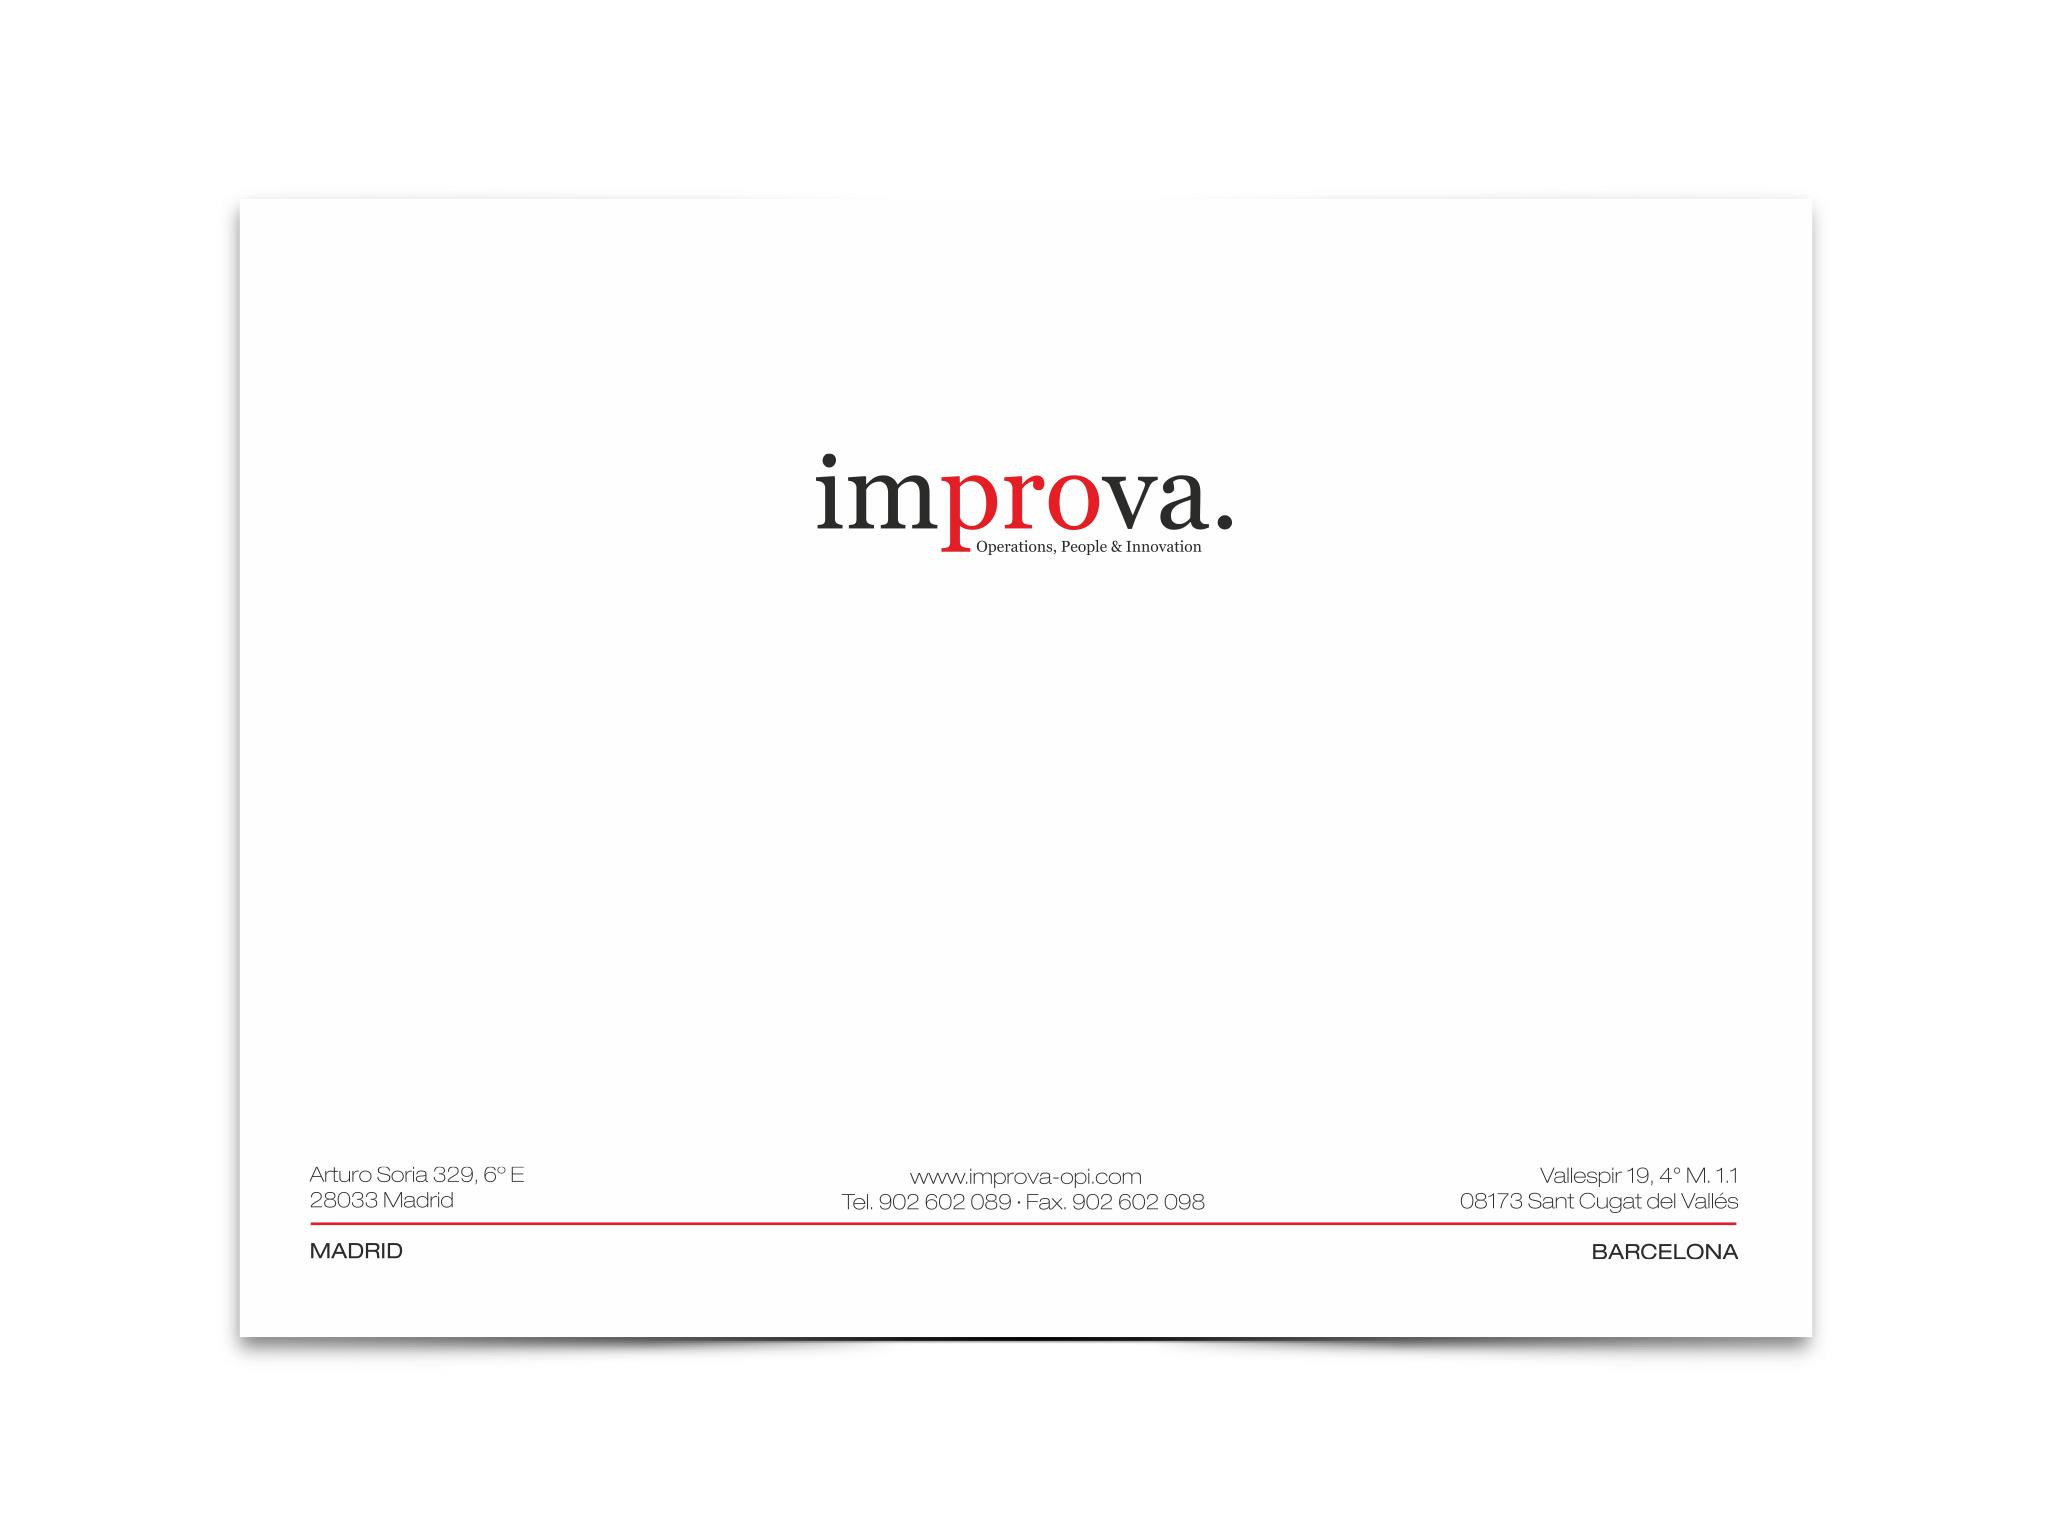 Improva_EMOTE_Branding.005.jpg